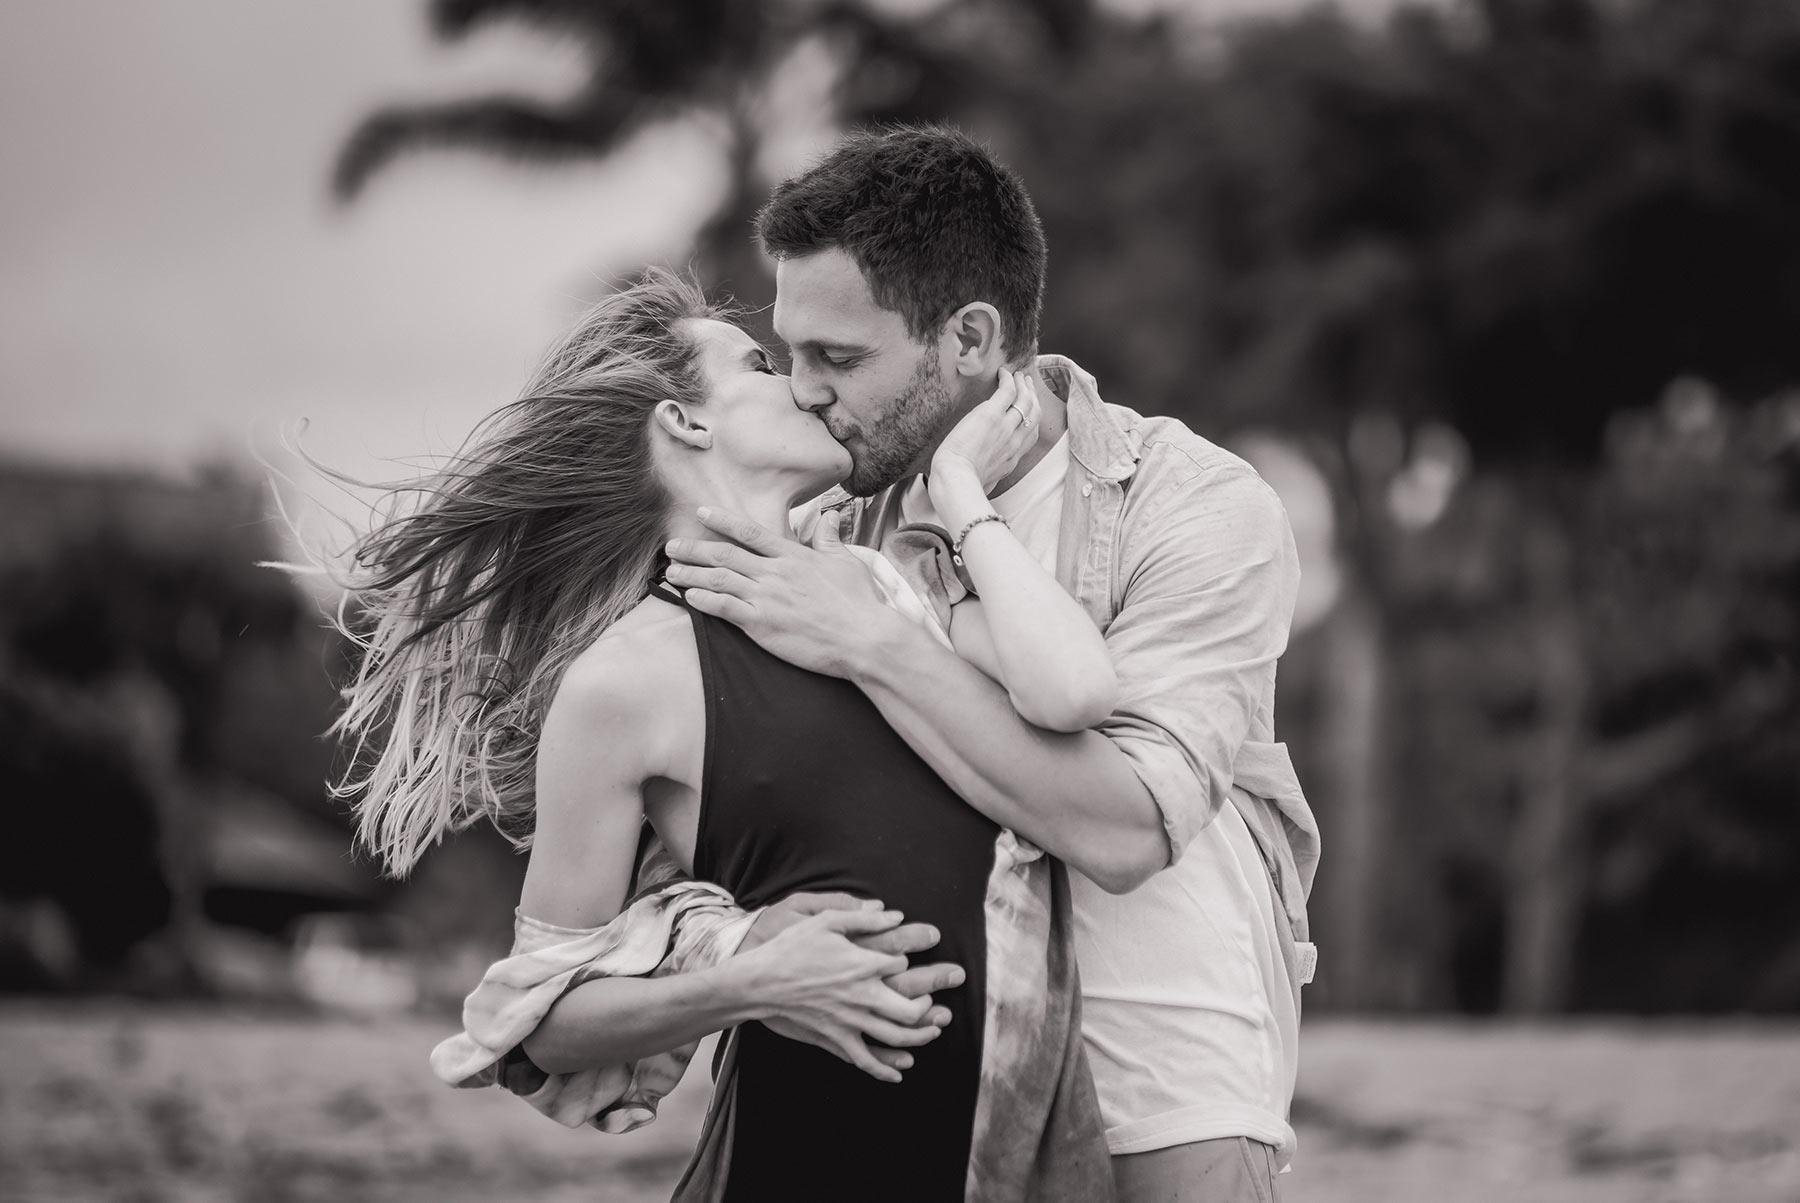 Kauai marriage proposal photographer